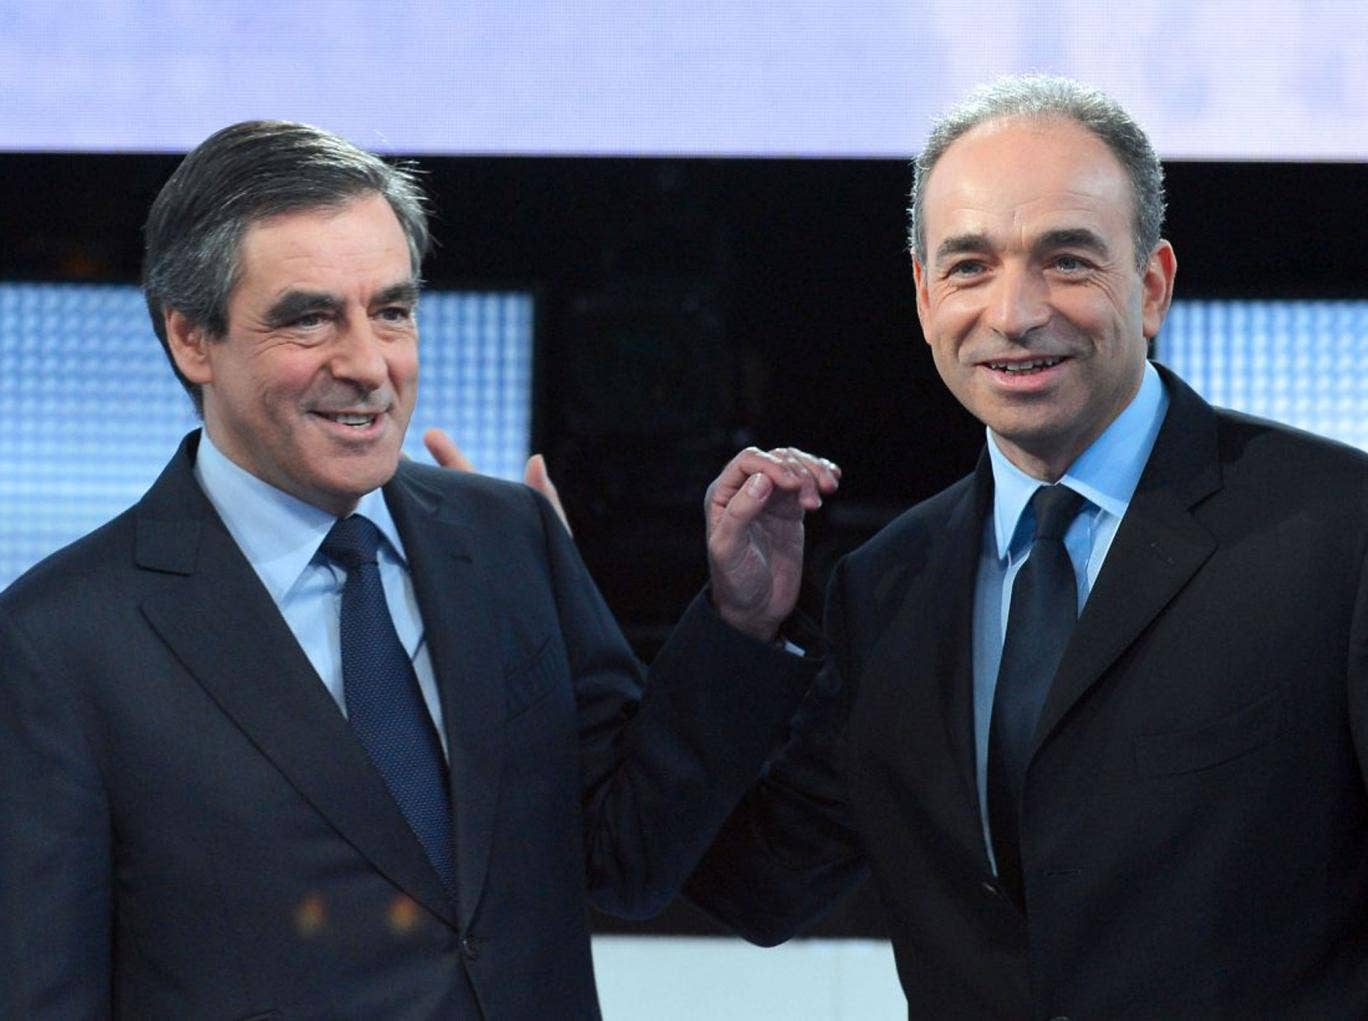 François Fillon and Jean-François Copé are vying for the UMP job